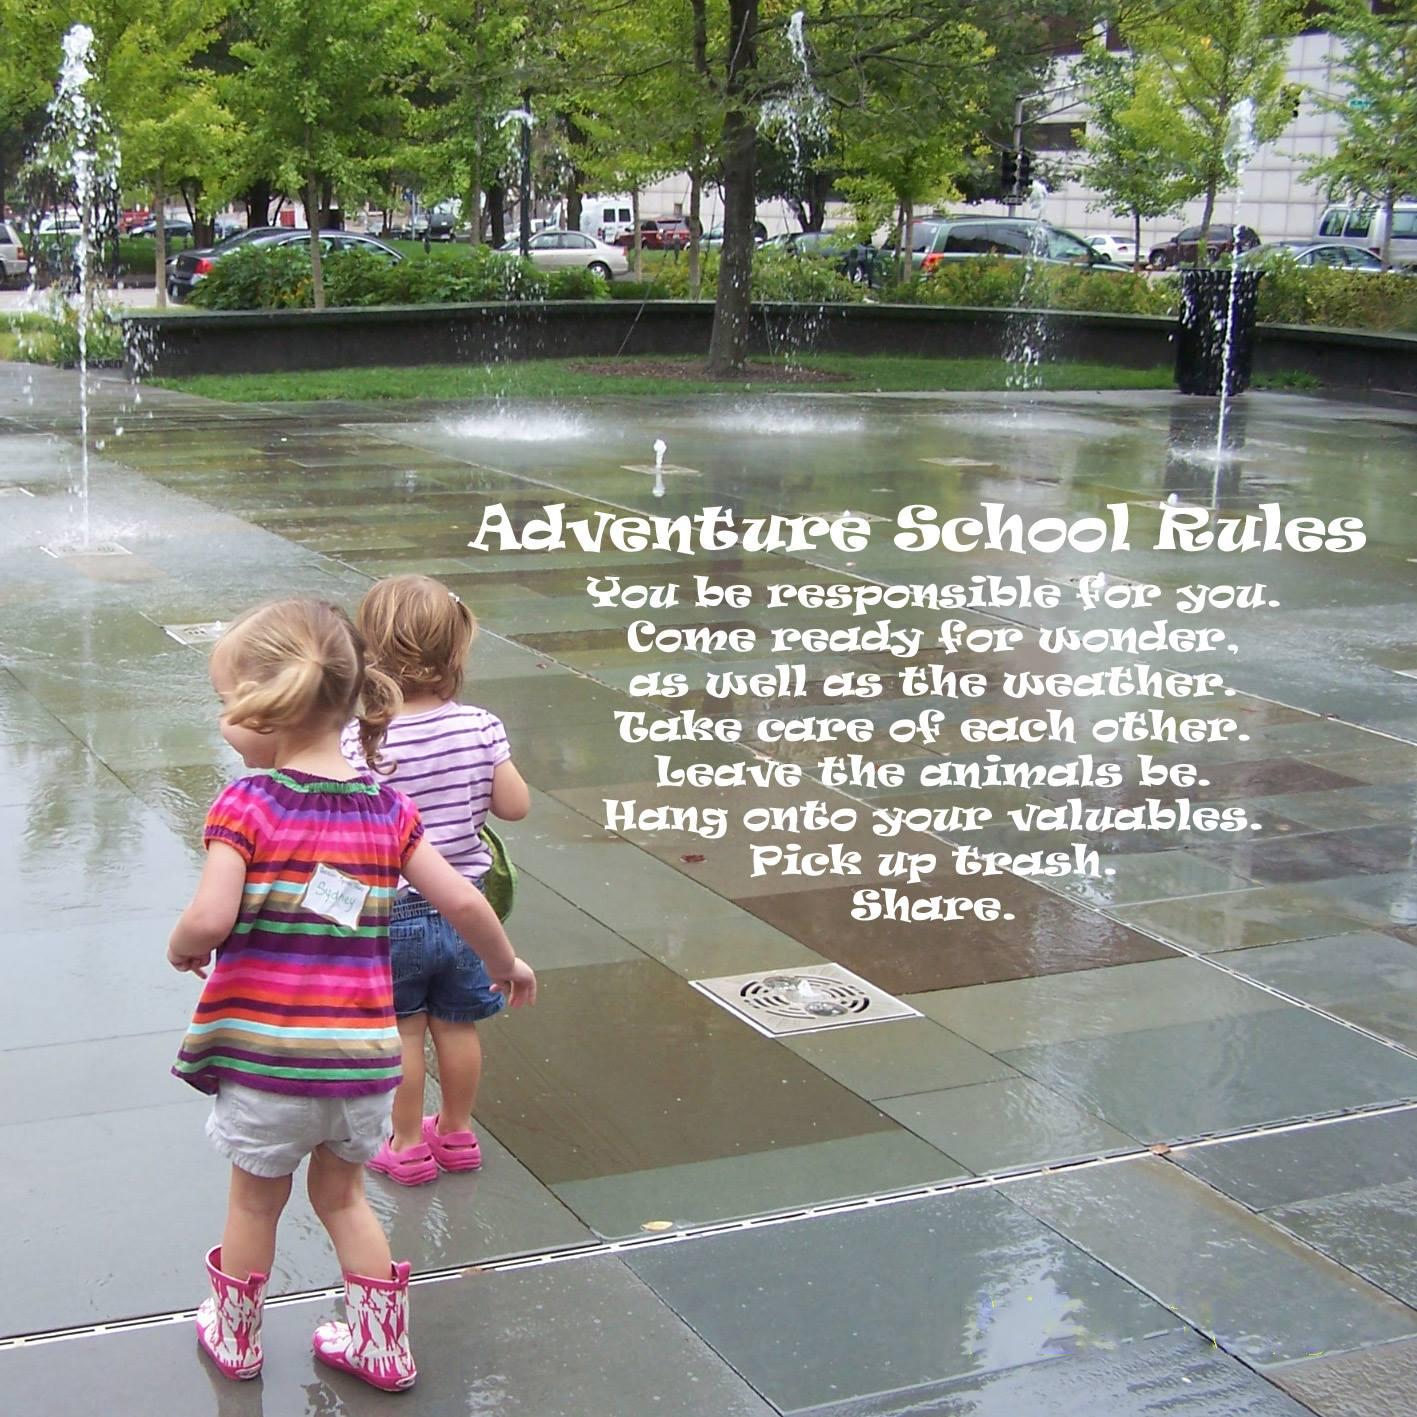 2016 Adventure School Rules